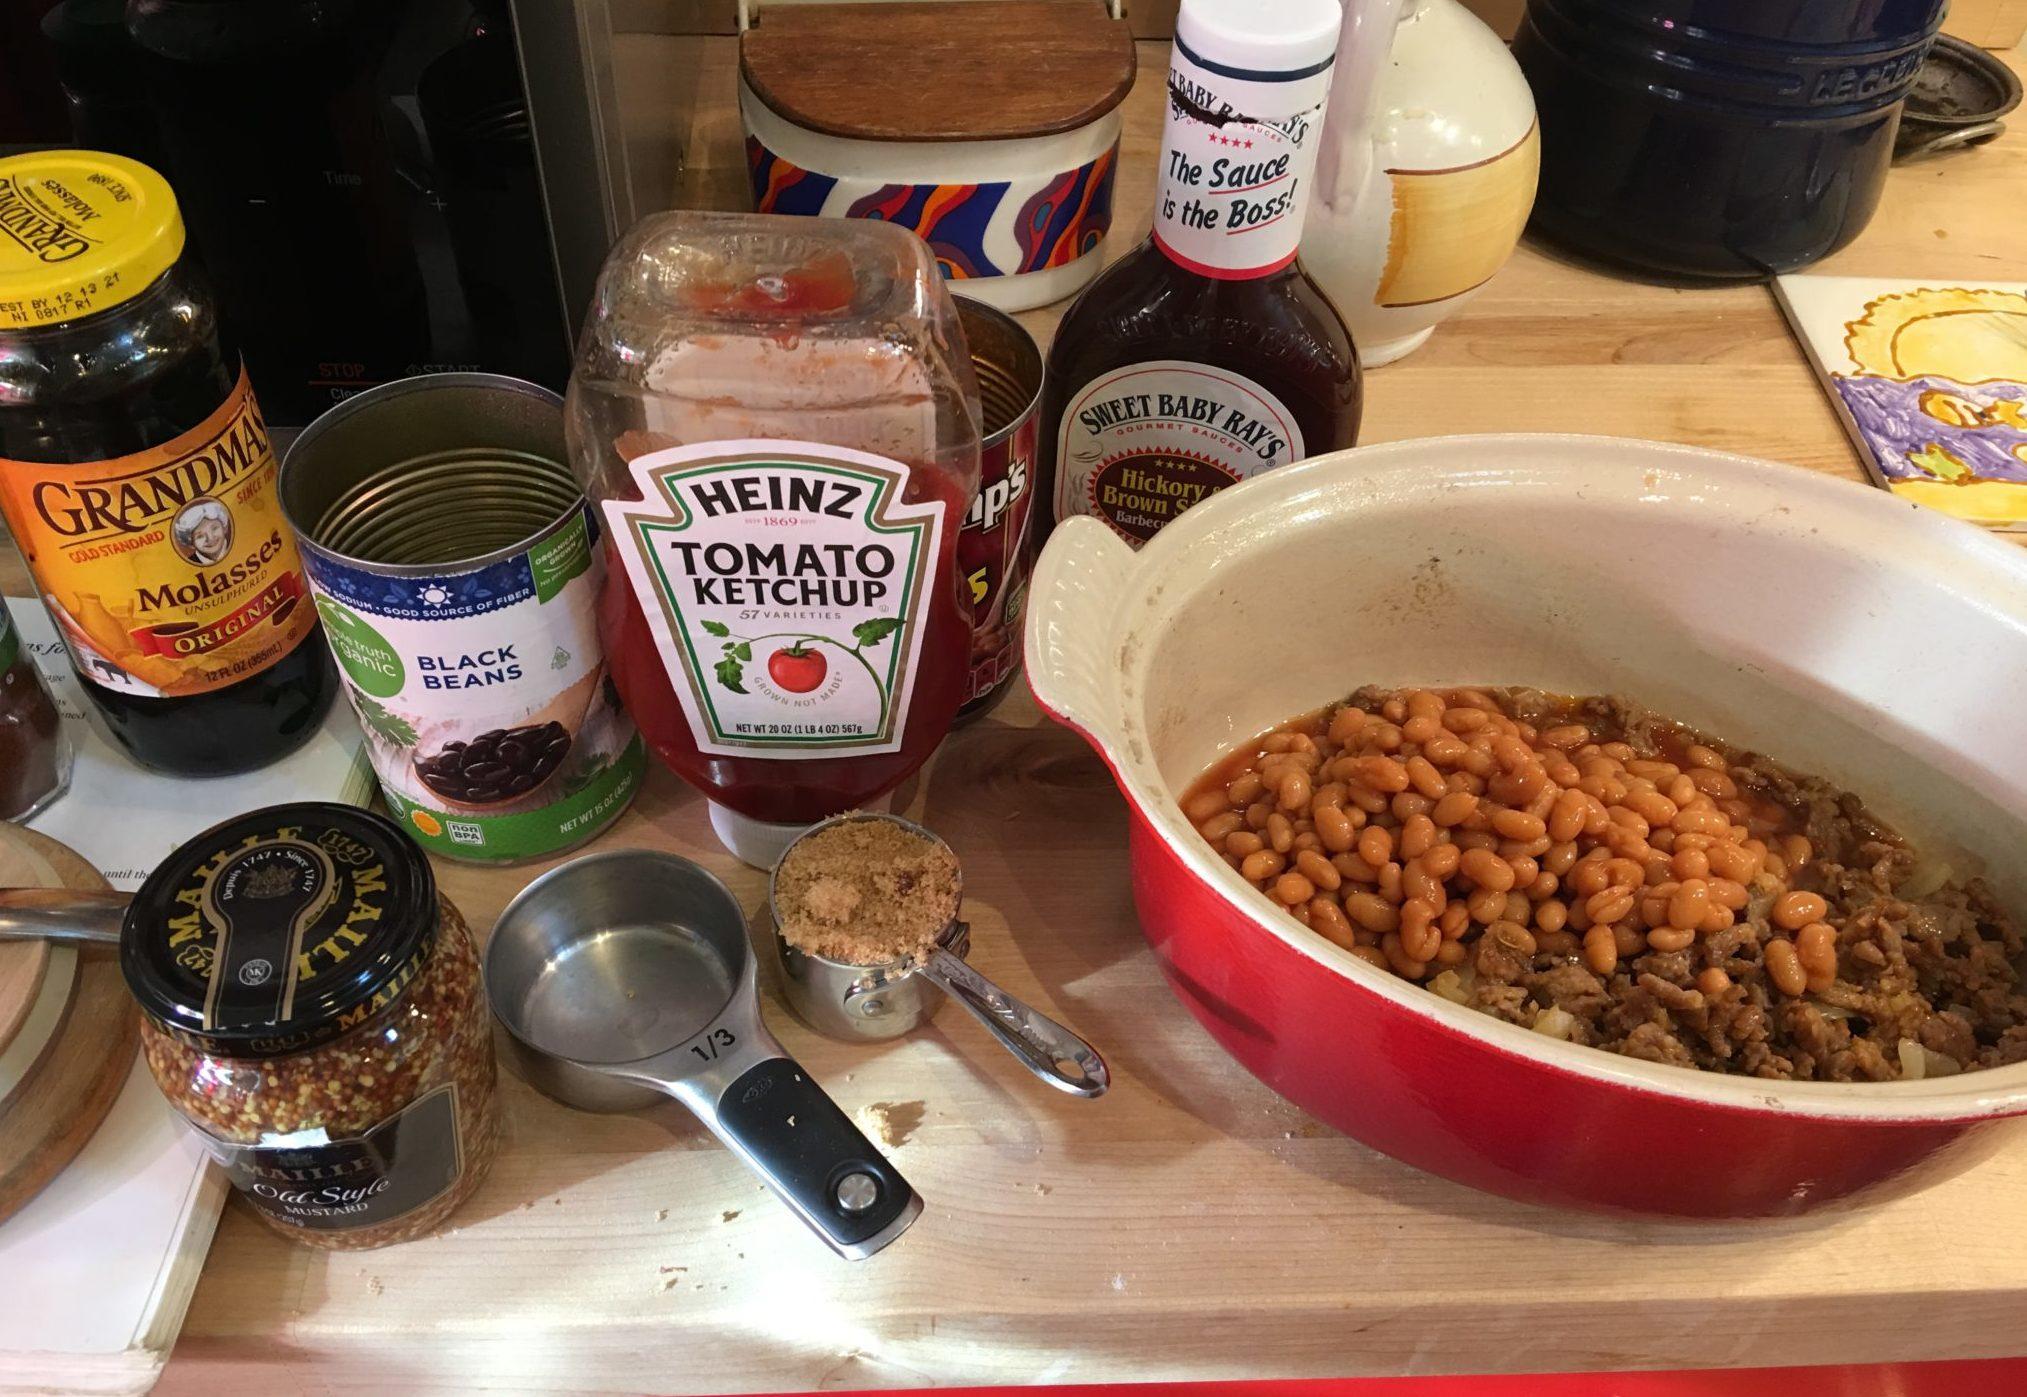 Spicy Baked Bean ingredients